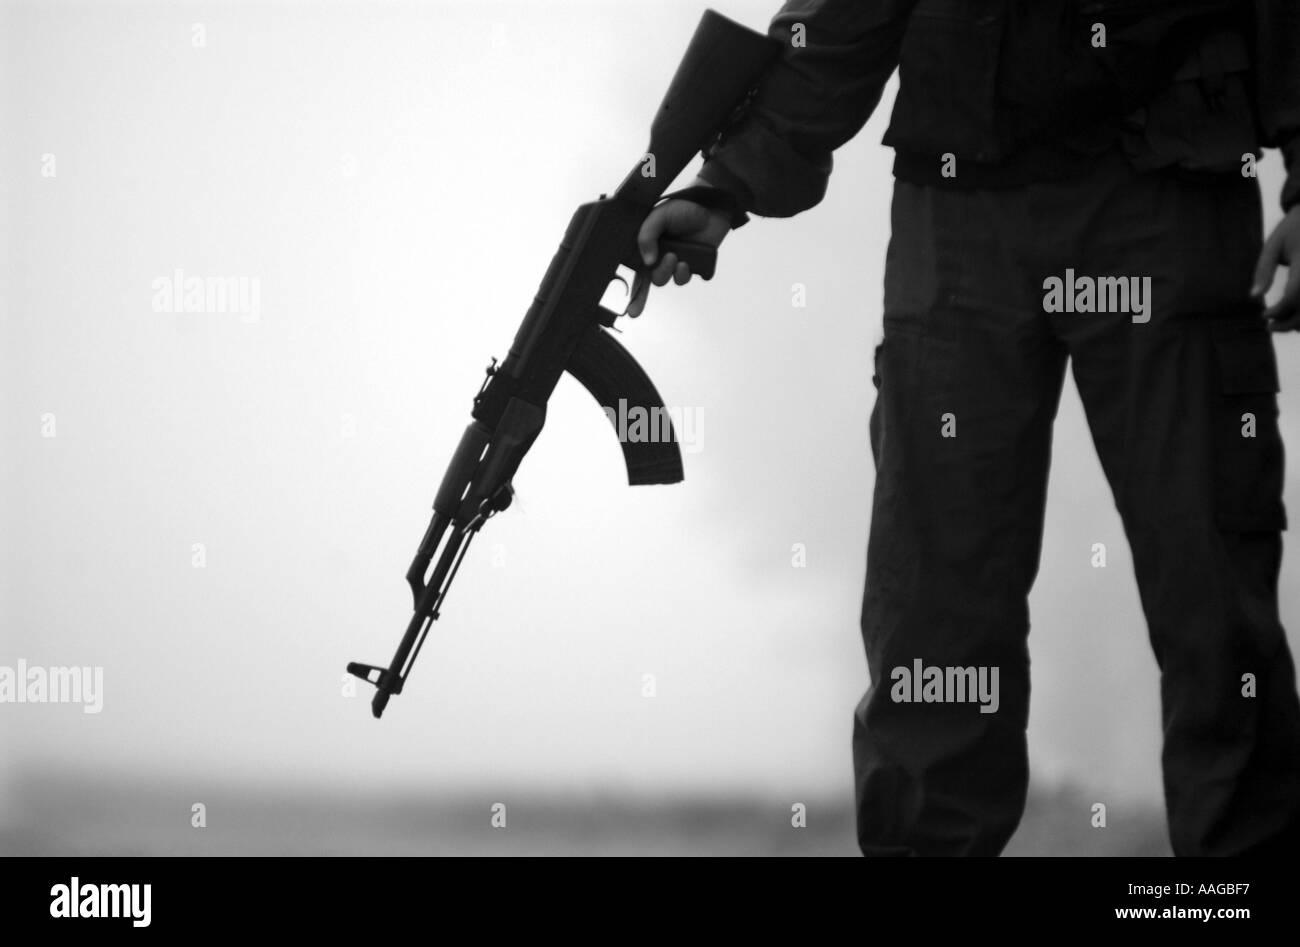 a terrorist dressed in a balaclava holding an AK47 kalashnikov rifle - Stock Image